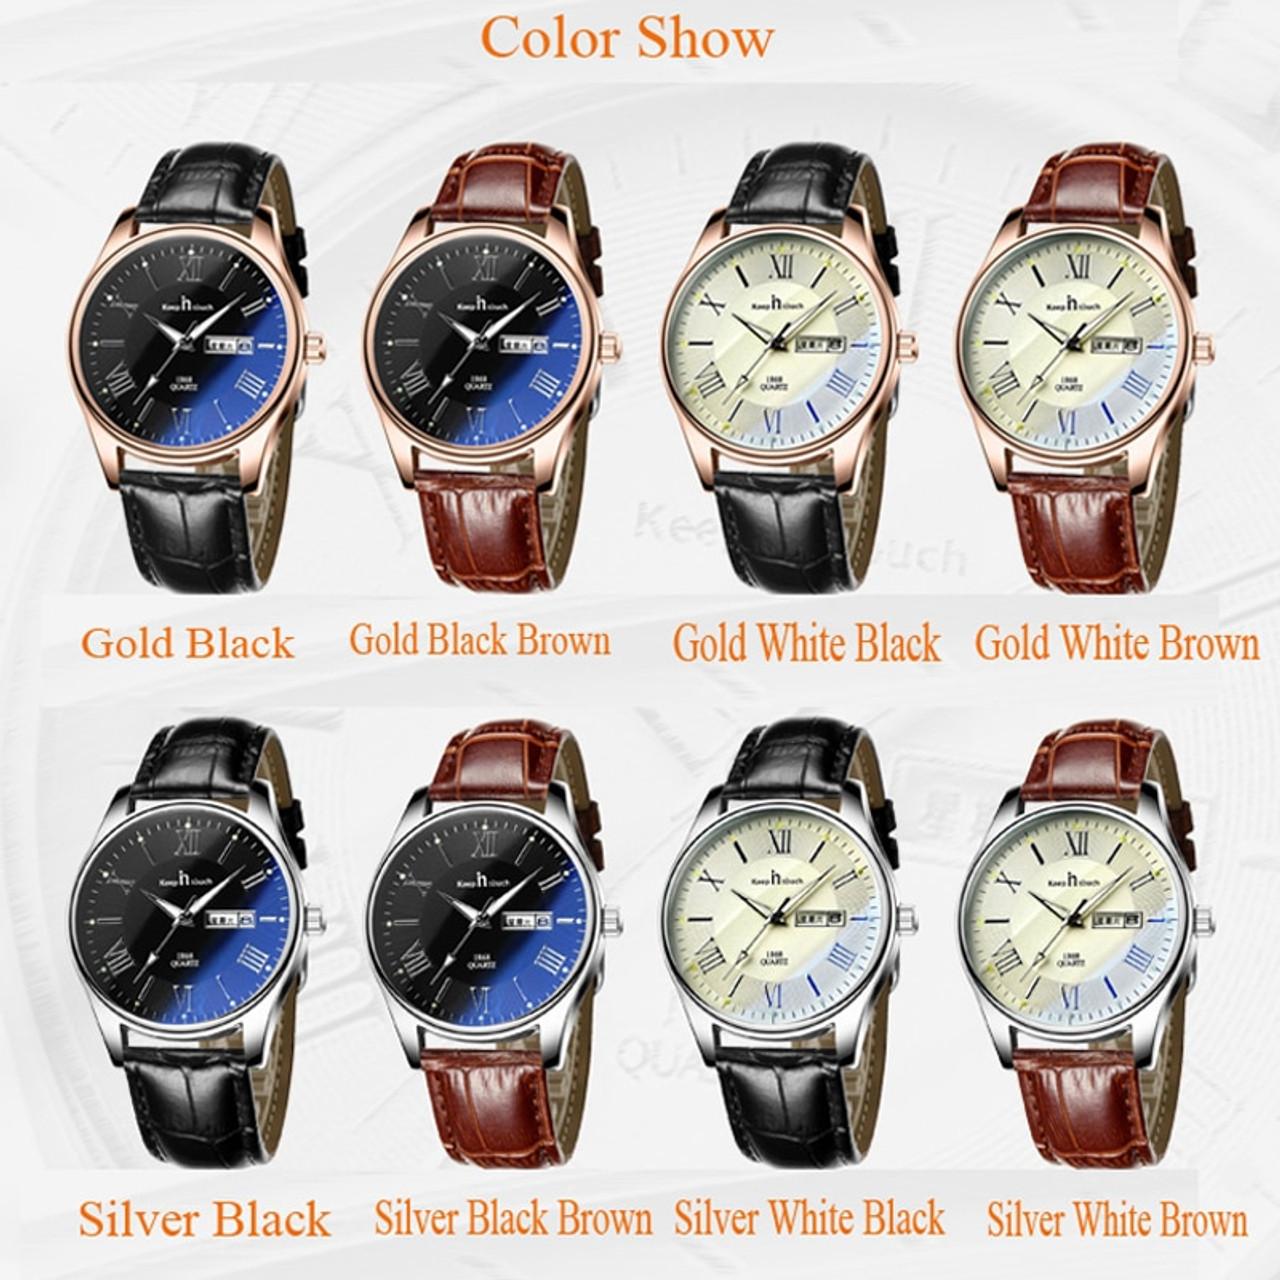 bdc390541 ... Casual Lovers Quartz Watch Relogio Feminino Men Women Gold Leather  Calendar Watches Luminous Luxury Ladies Fashion ...